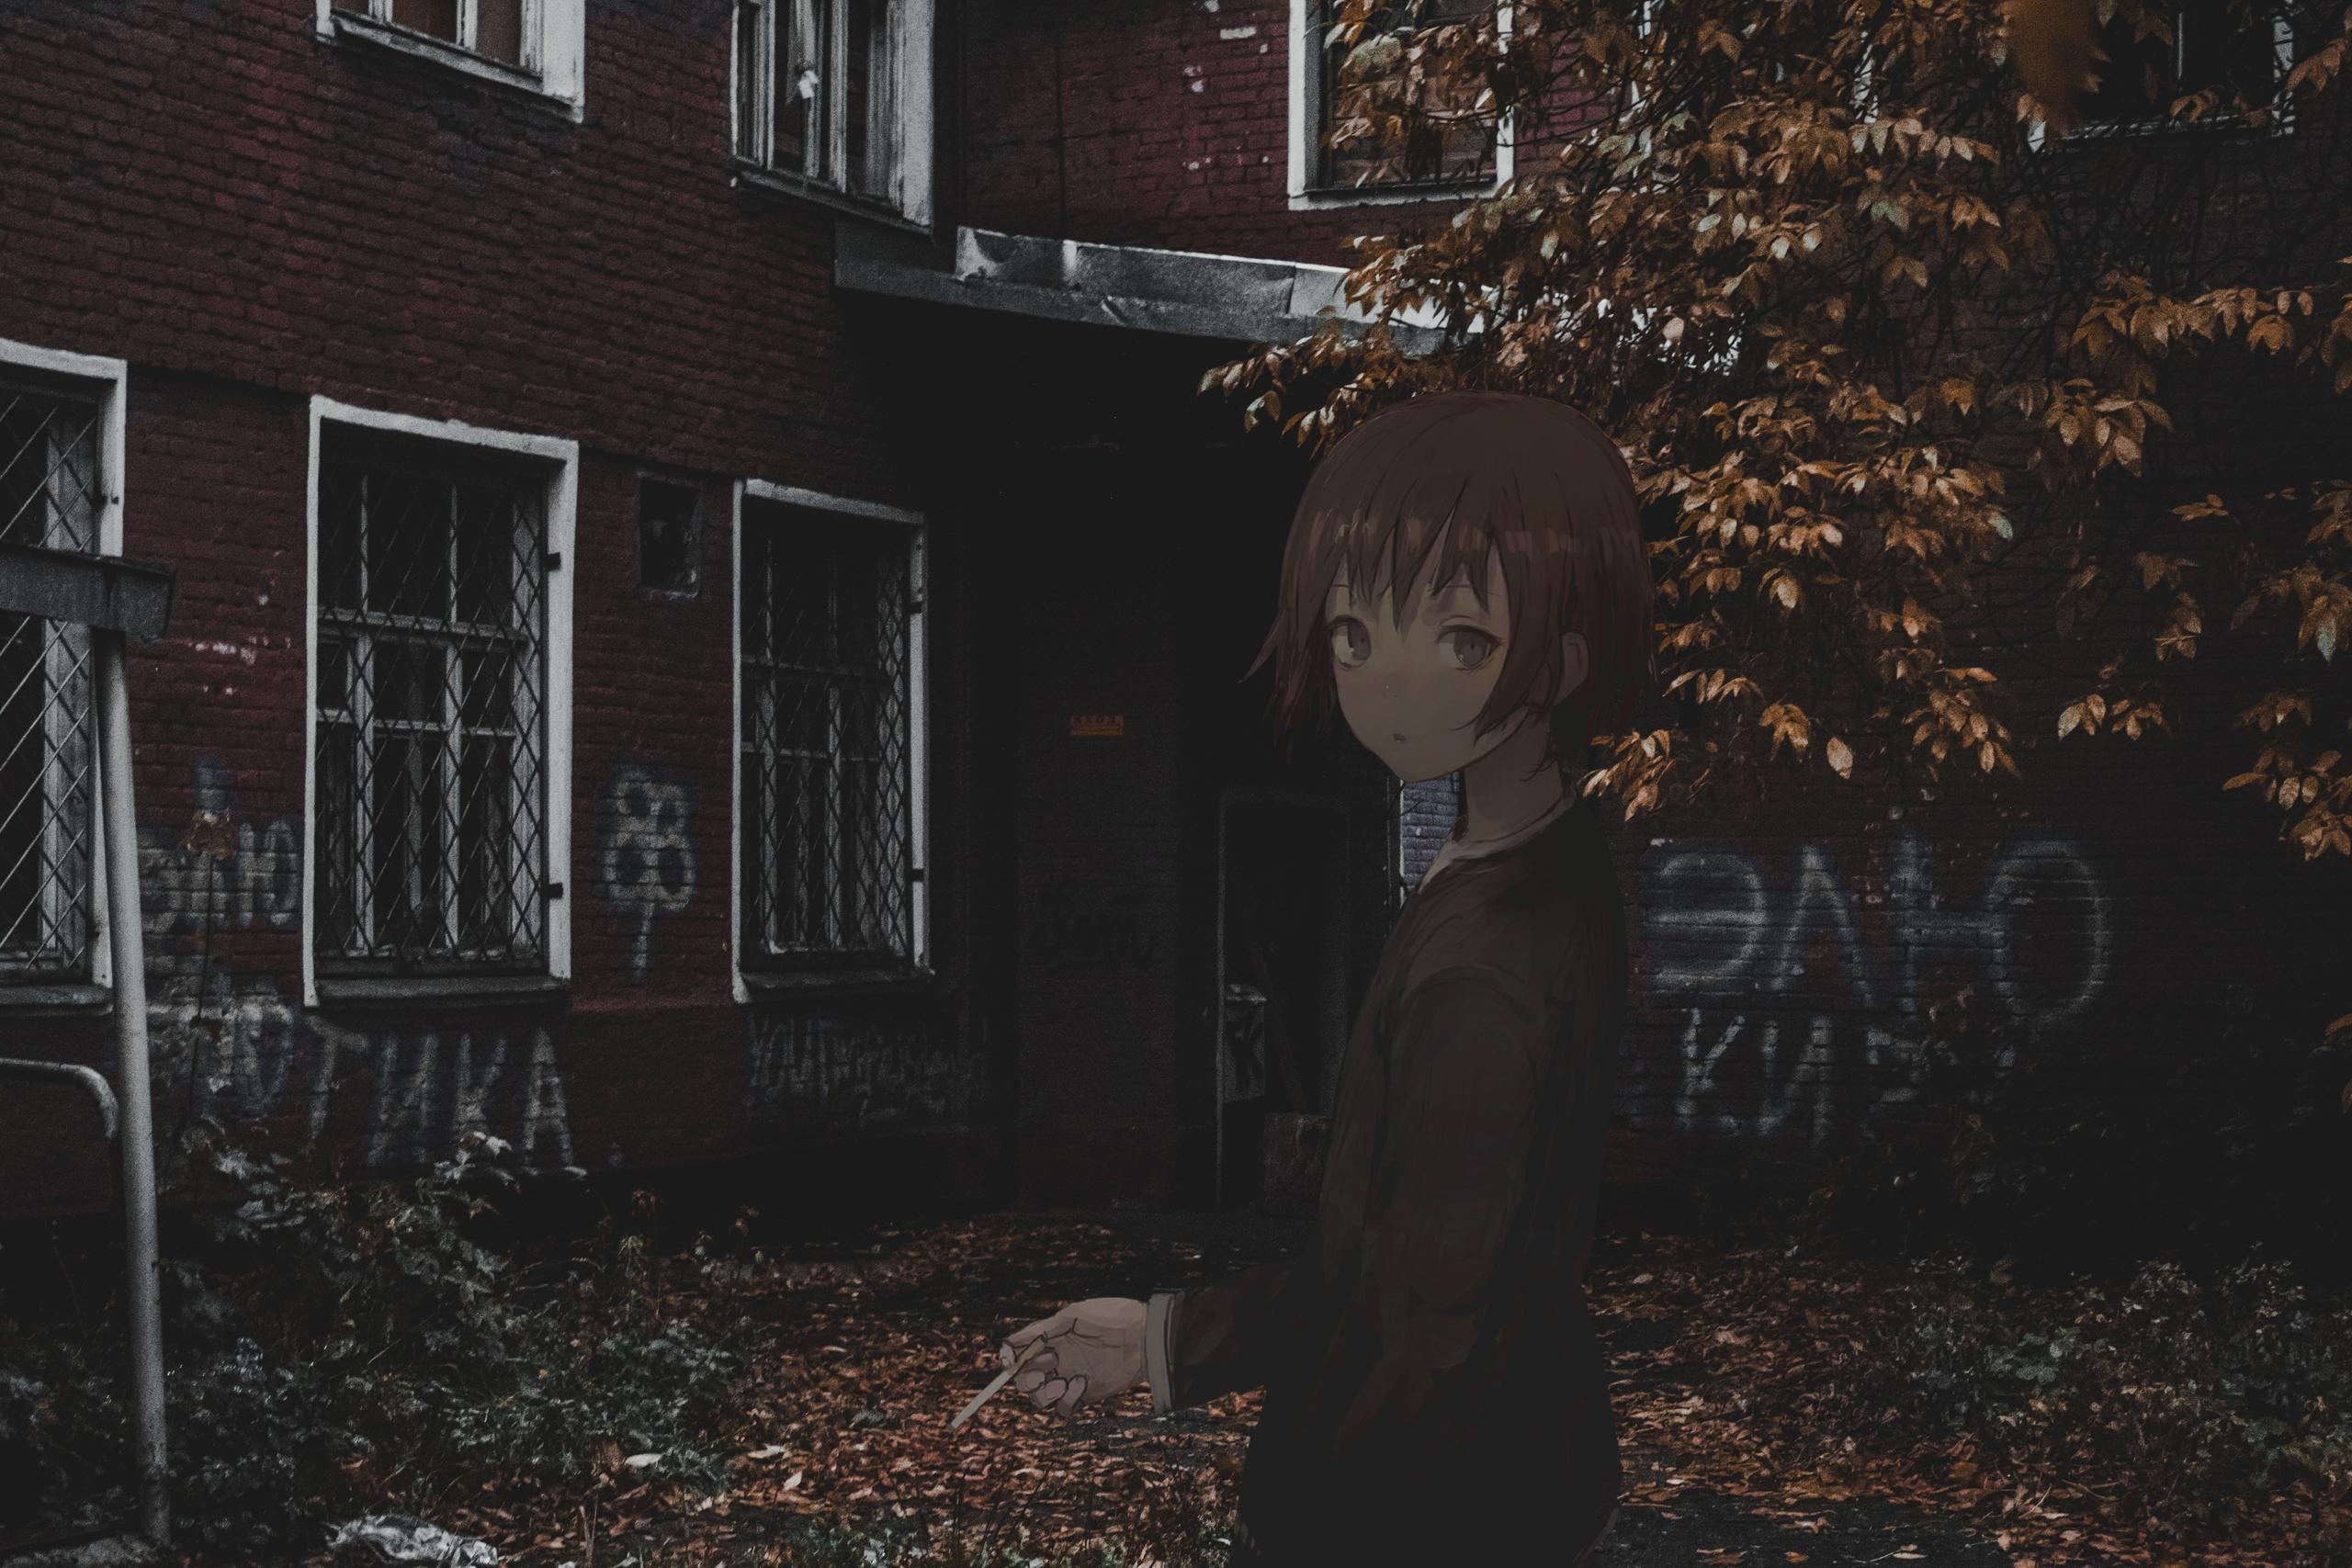 Anime 2560x1707 shion (mirudakemann) anime girls 2D cigarettes fall short hair evening anime urban Russia